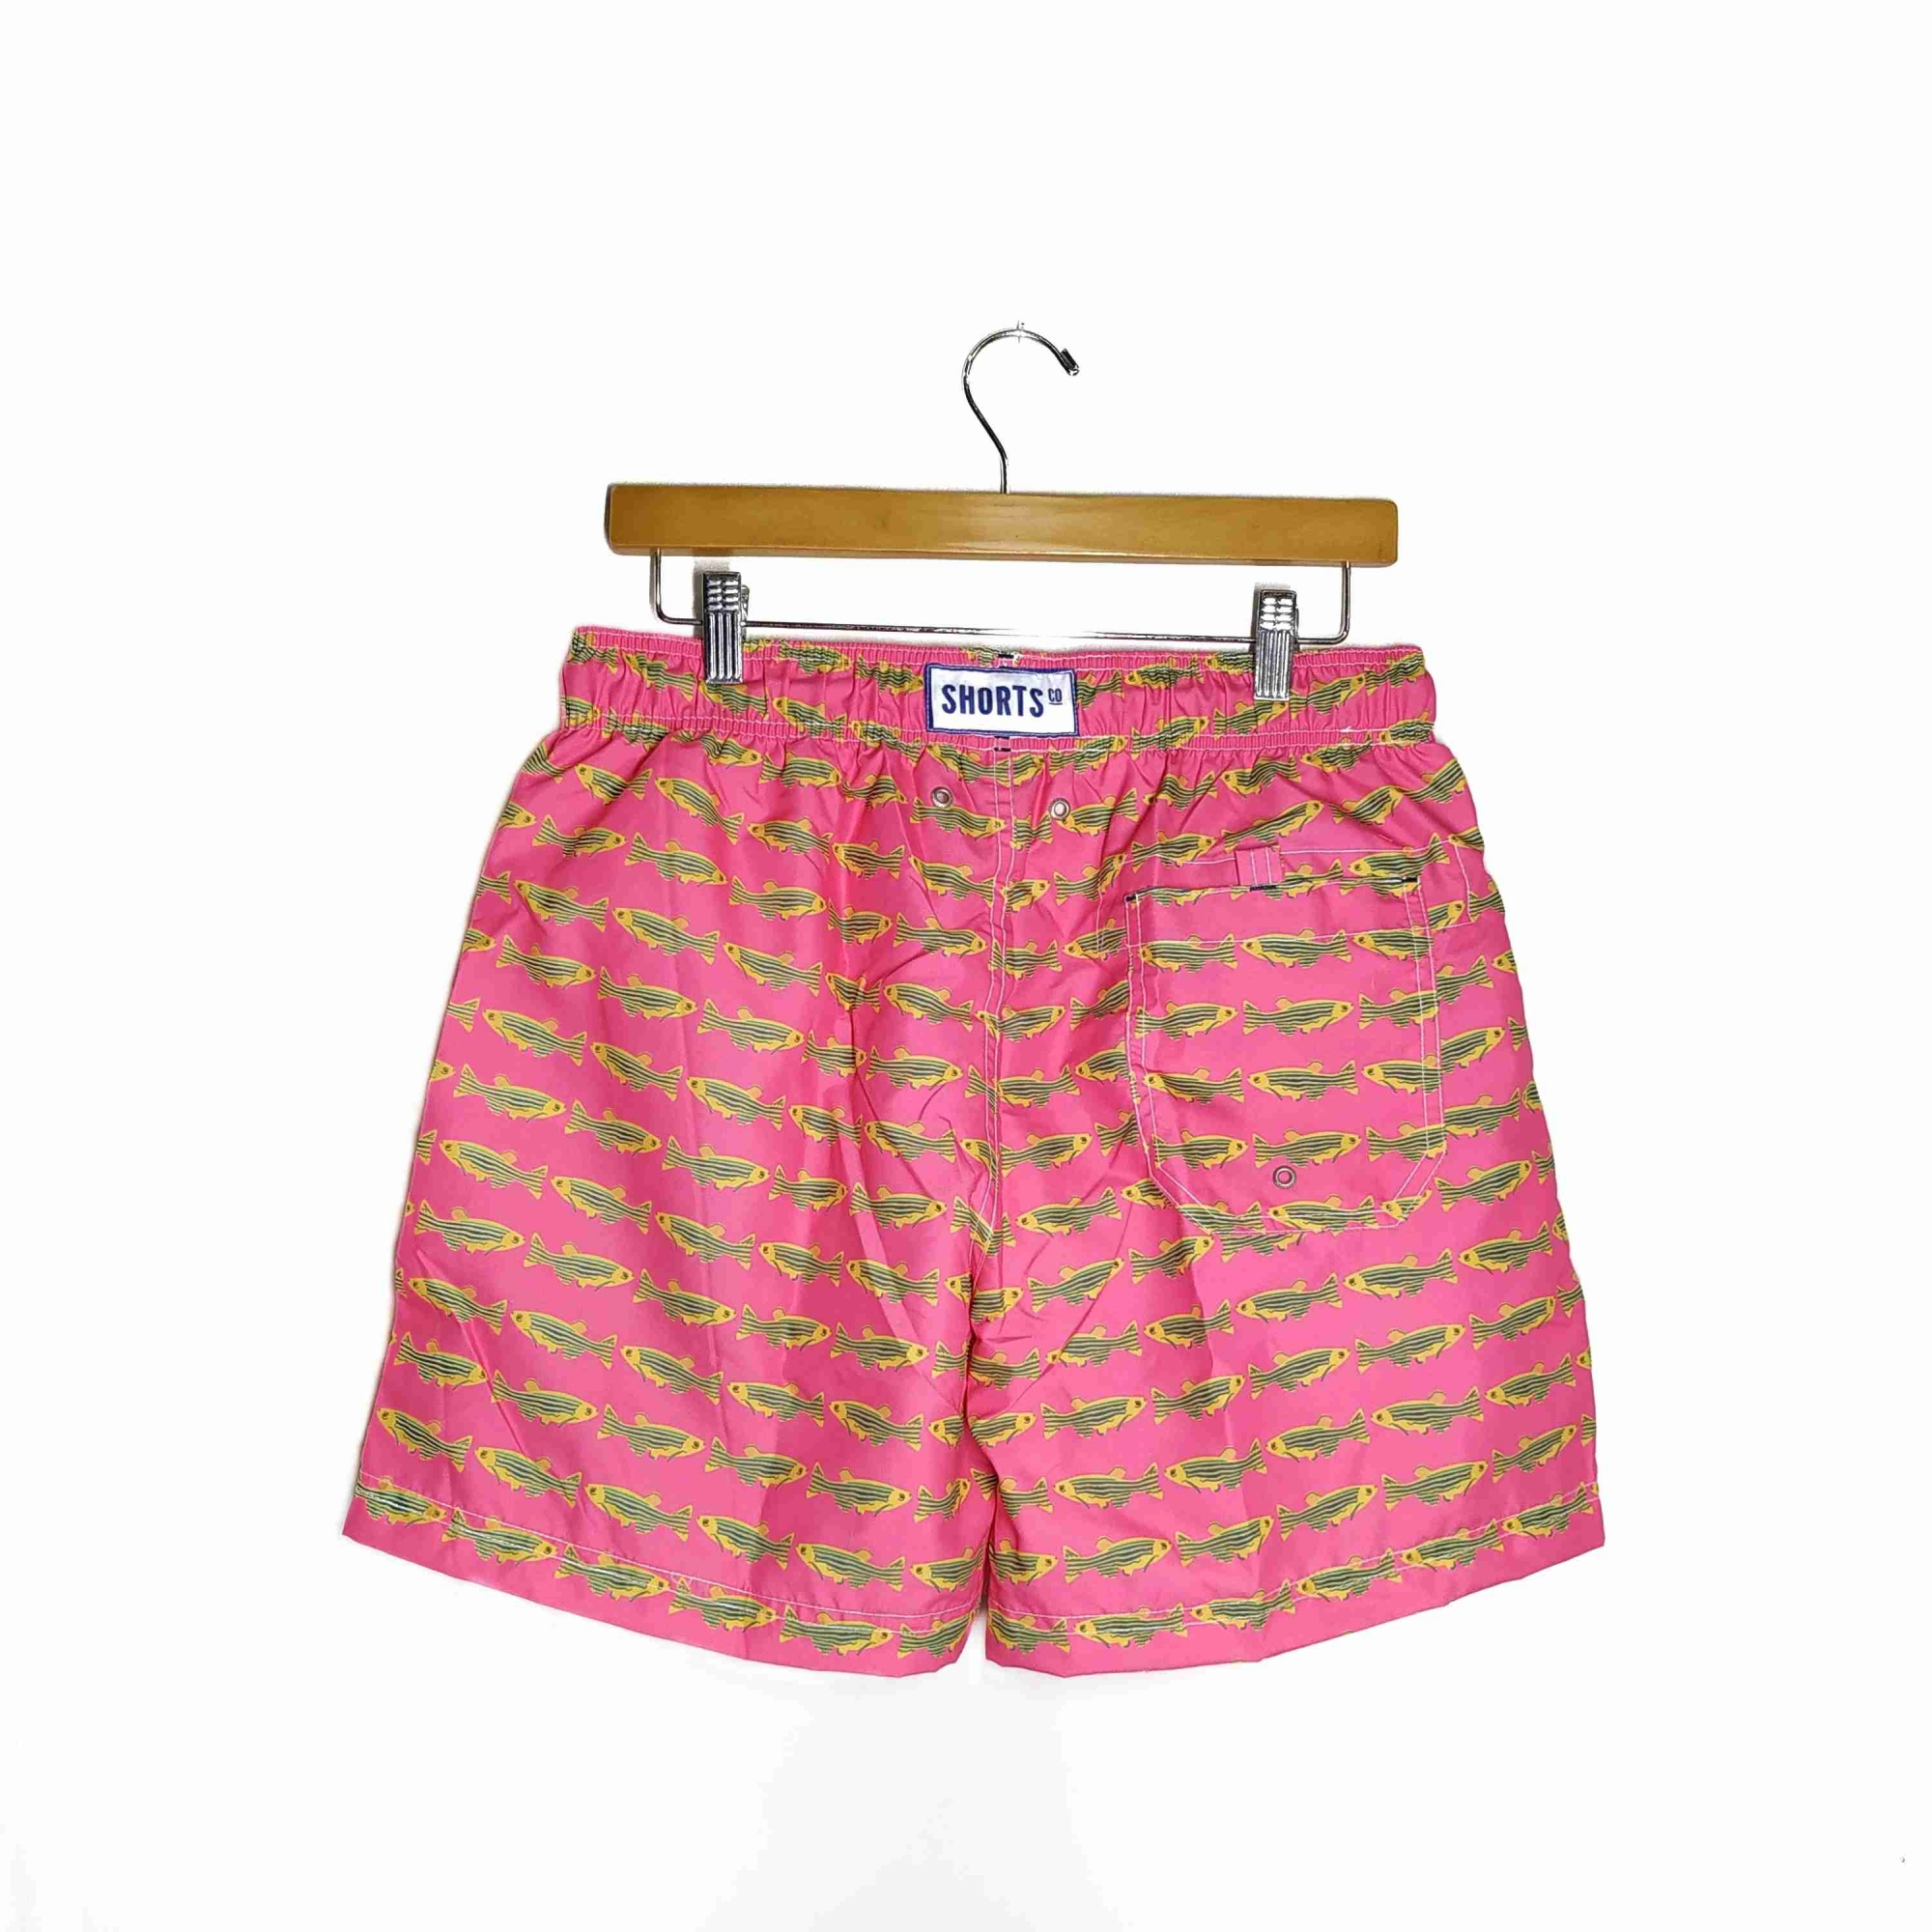 Shorts Co Shorts Regular Paulistinha Adulto